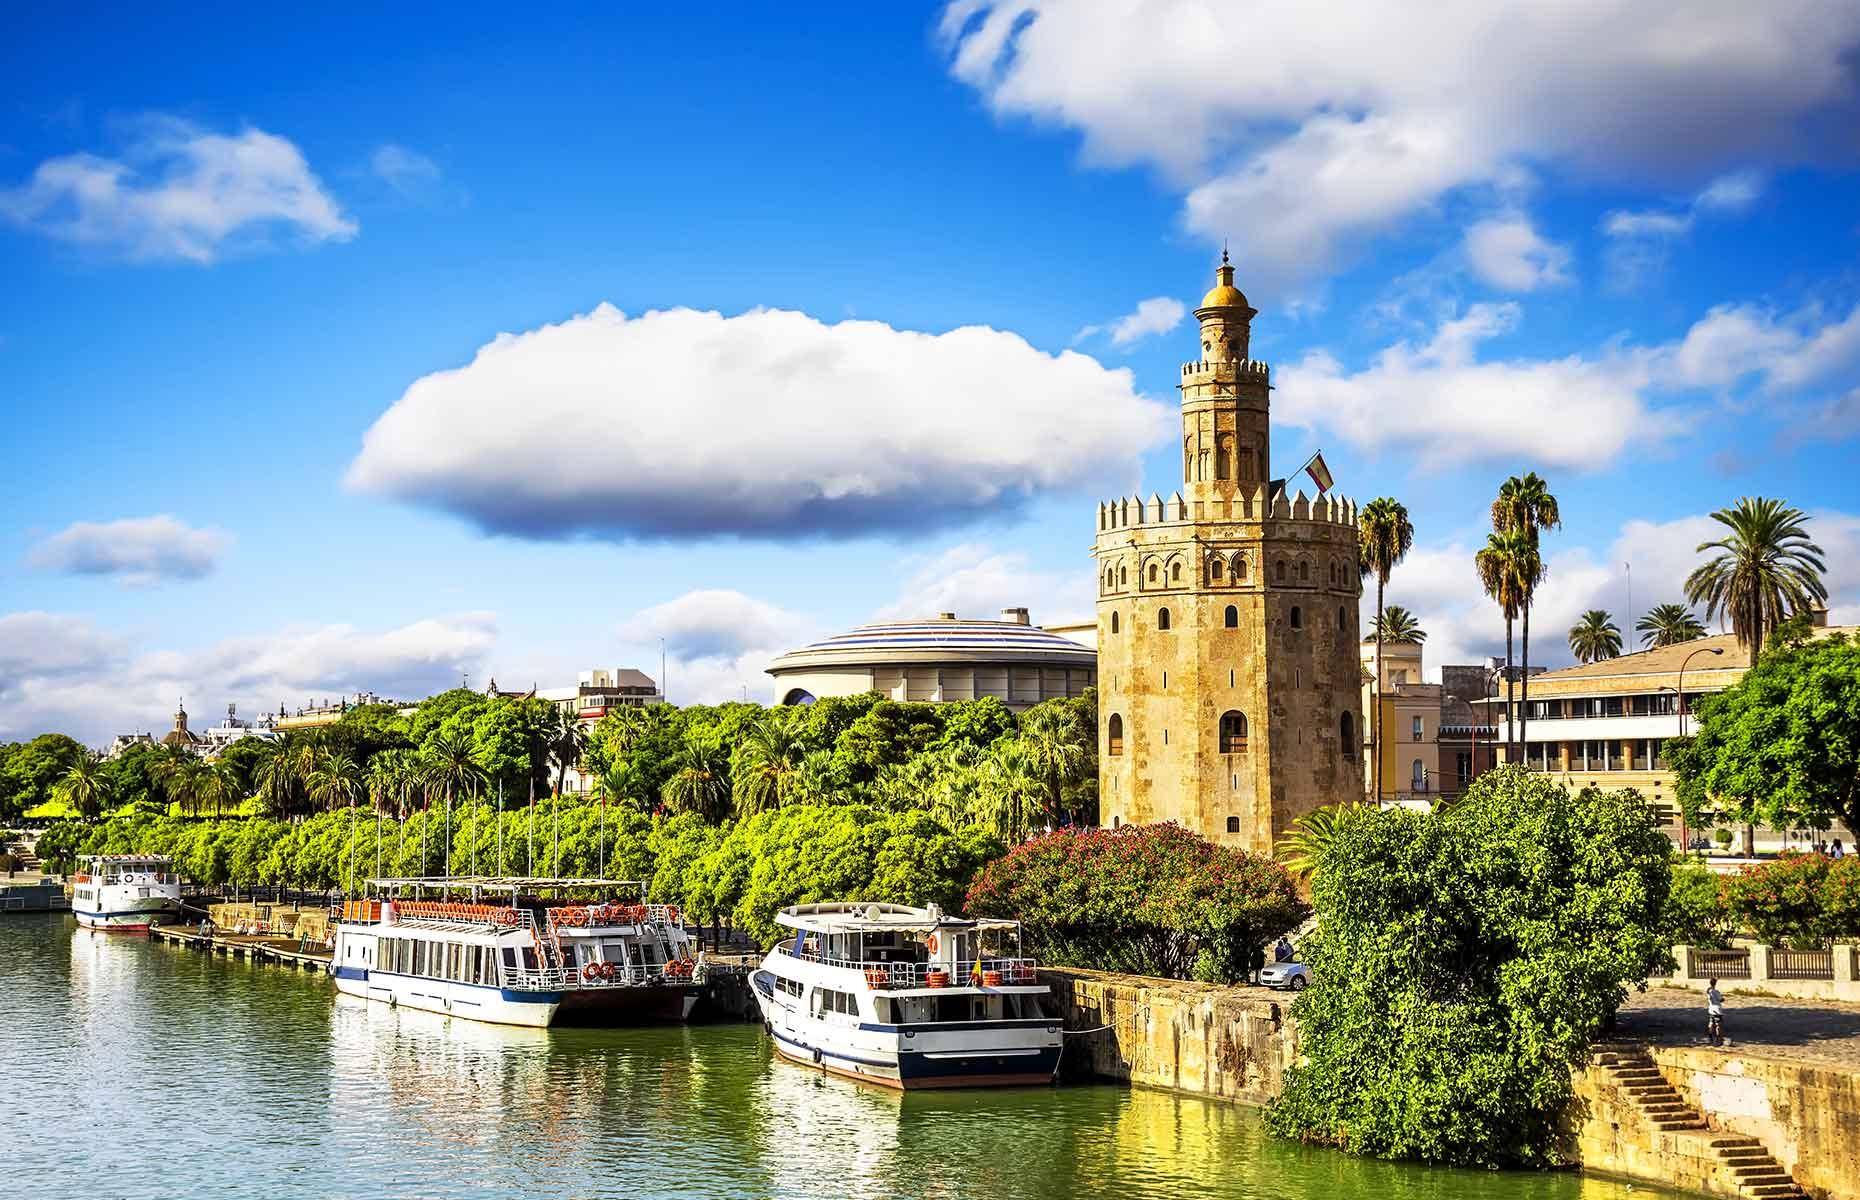 The Torre Del Oro, Seville, faces the river